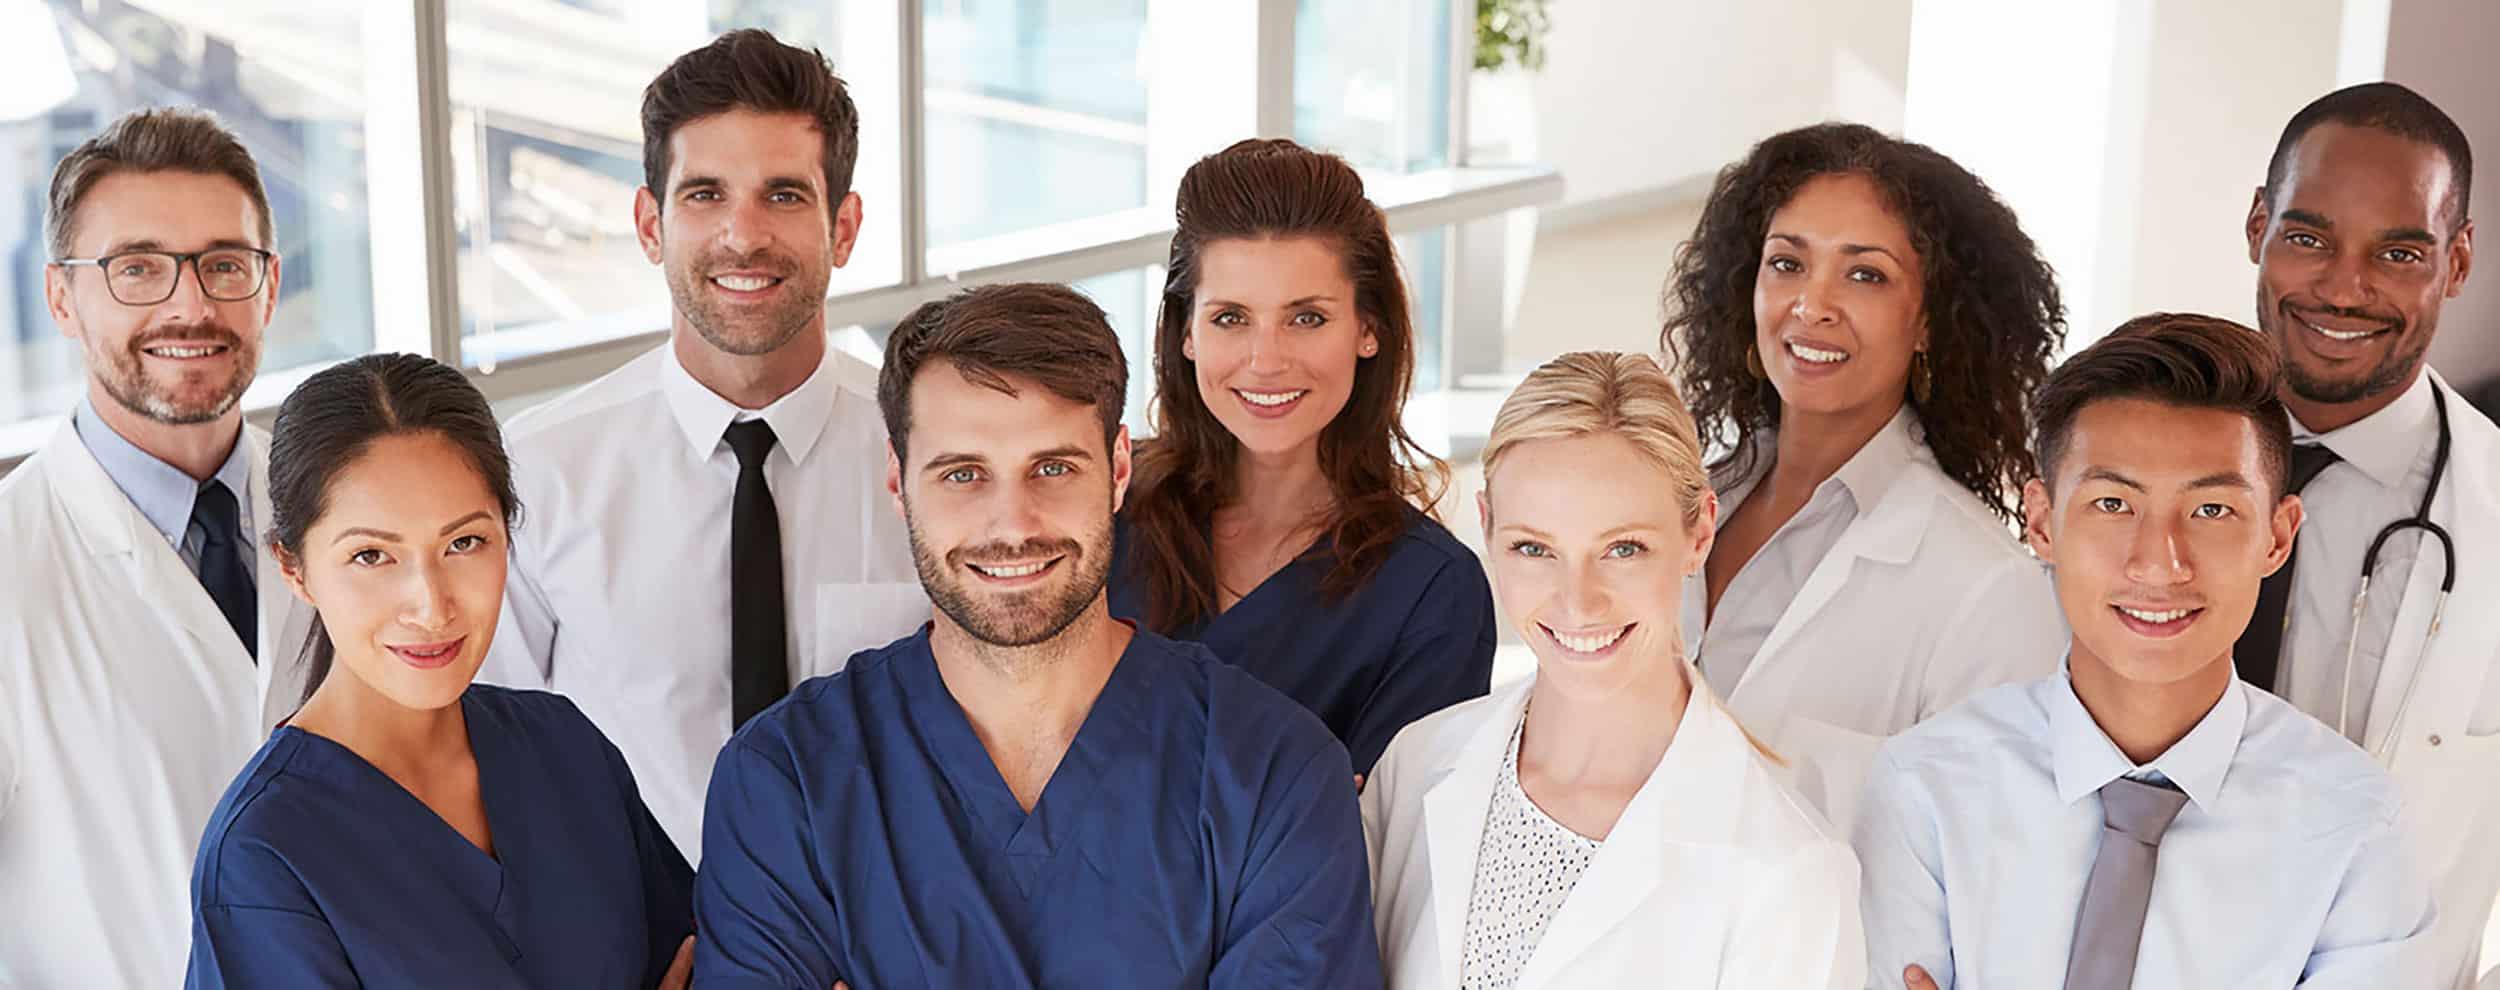 Nurse-Groups-1536x608-1